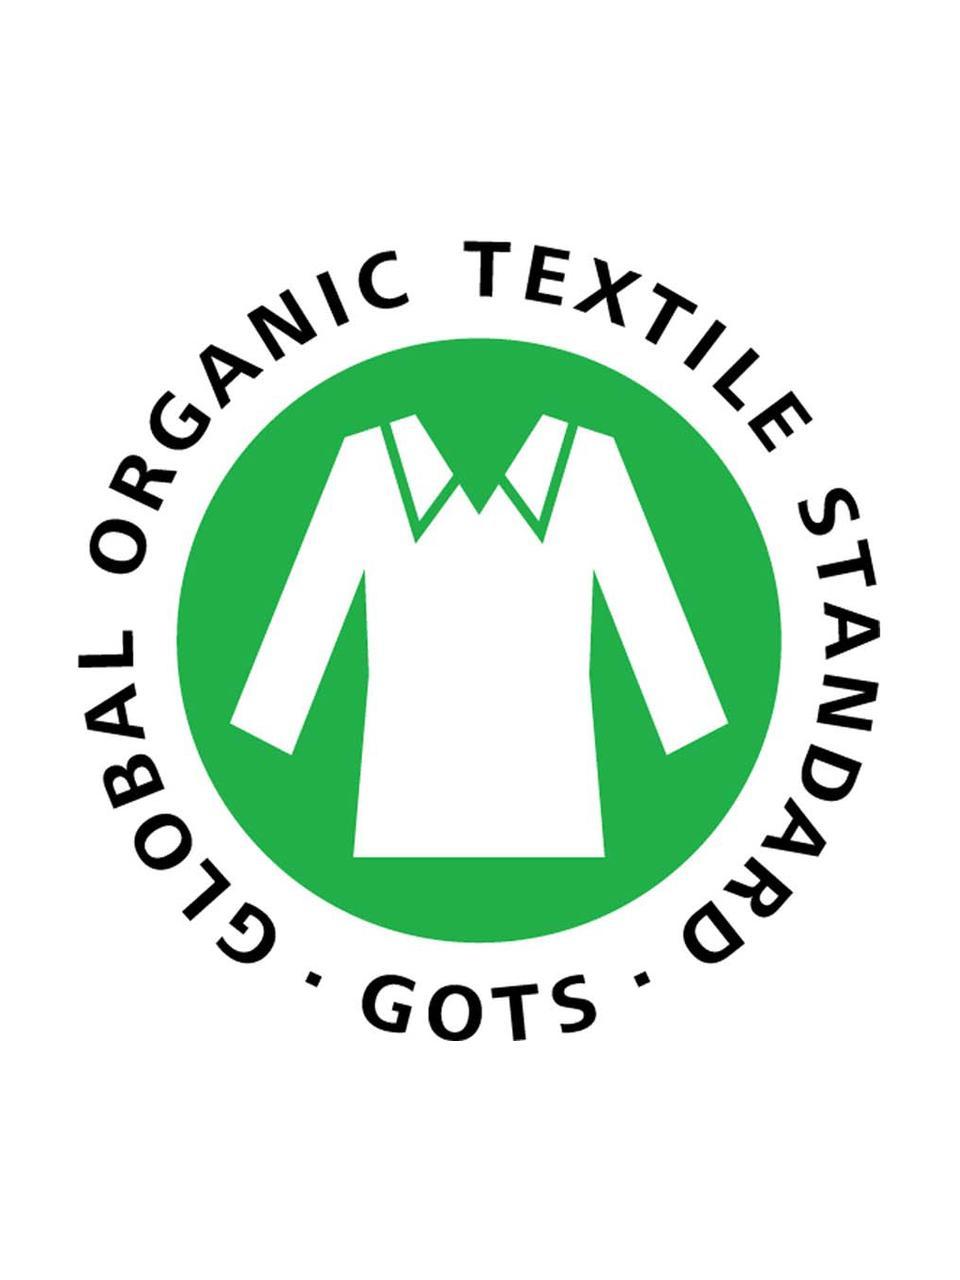 Mulltücher Fawn aus Bio-Baumwolle, 2 Stück, 100% Biobaumwolle, GOTS-zertifiziert, Weiss, Braun, Beige, Gelb, Rosa, Grün, 70 x 70 cm